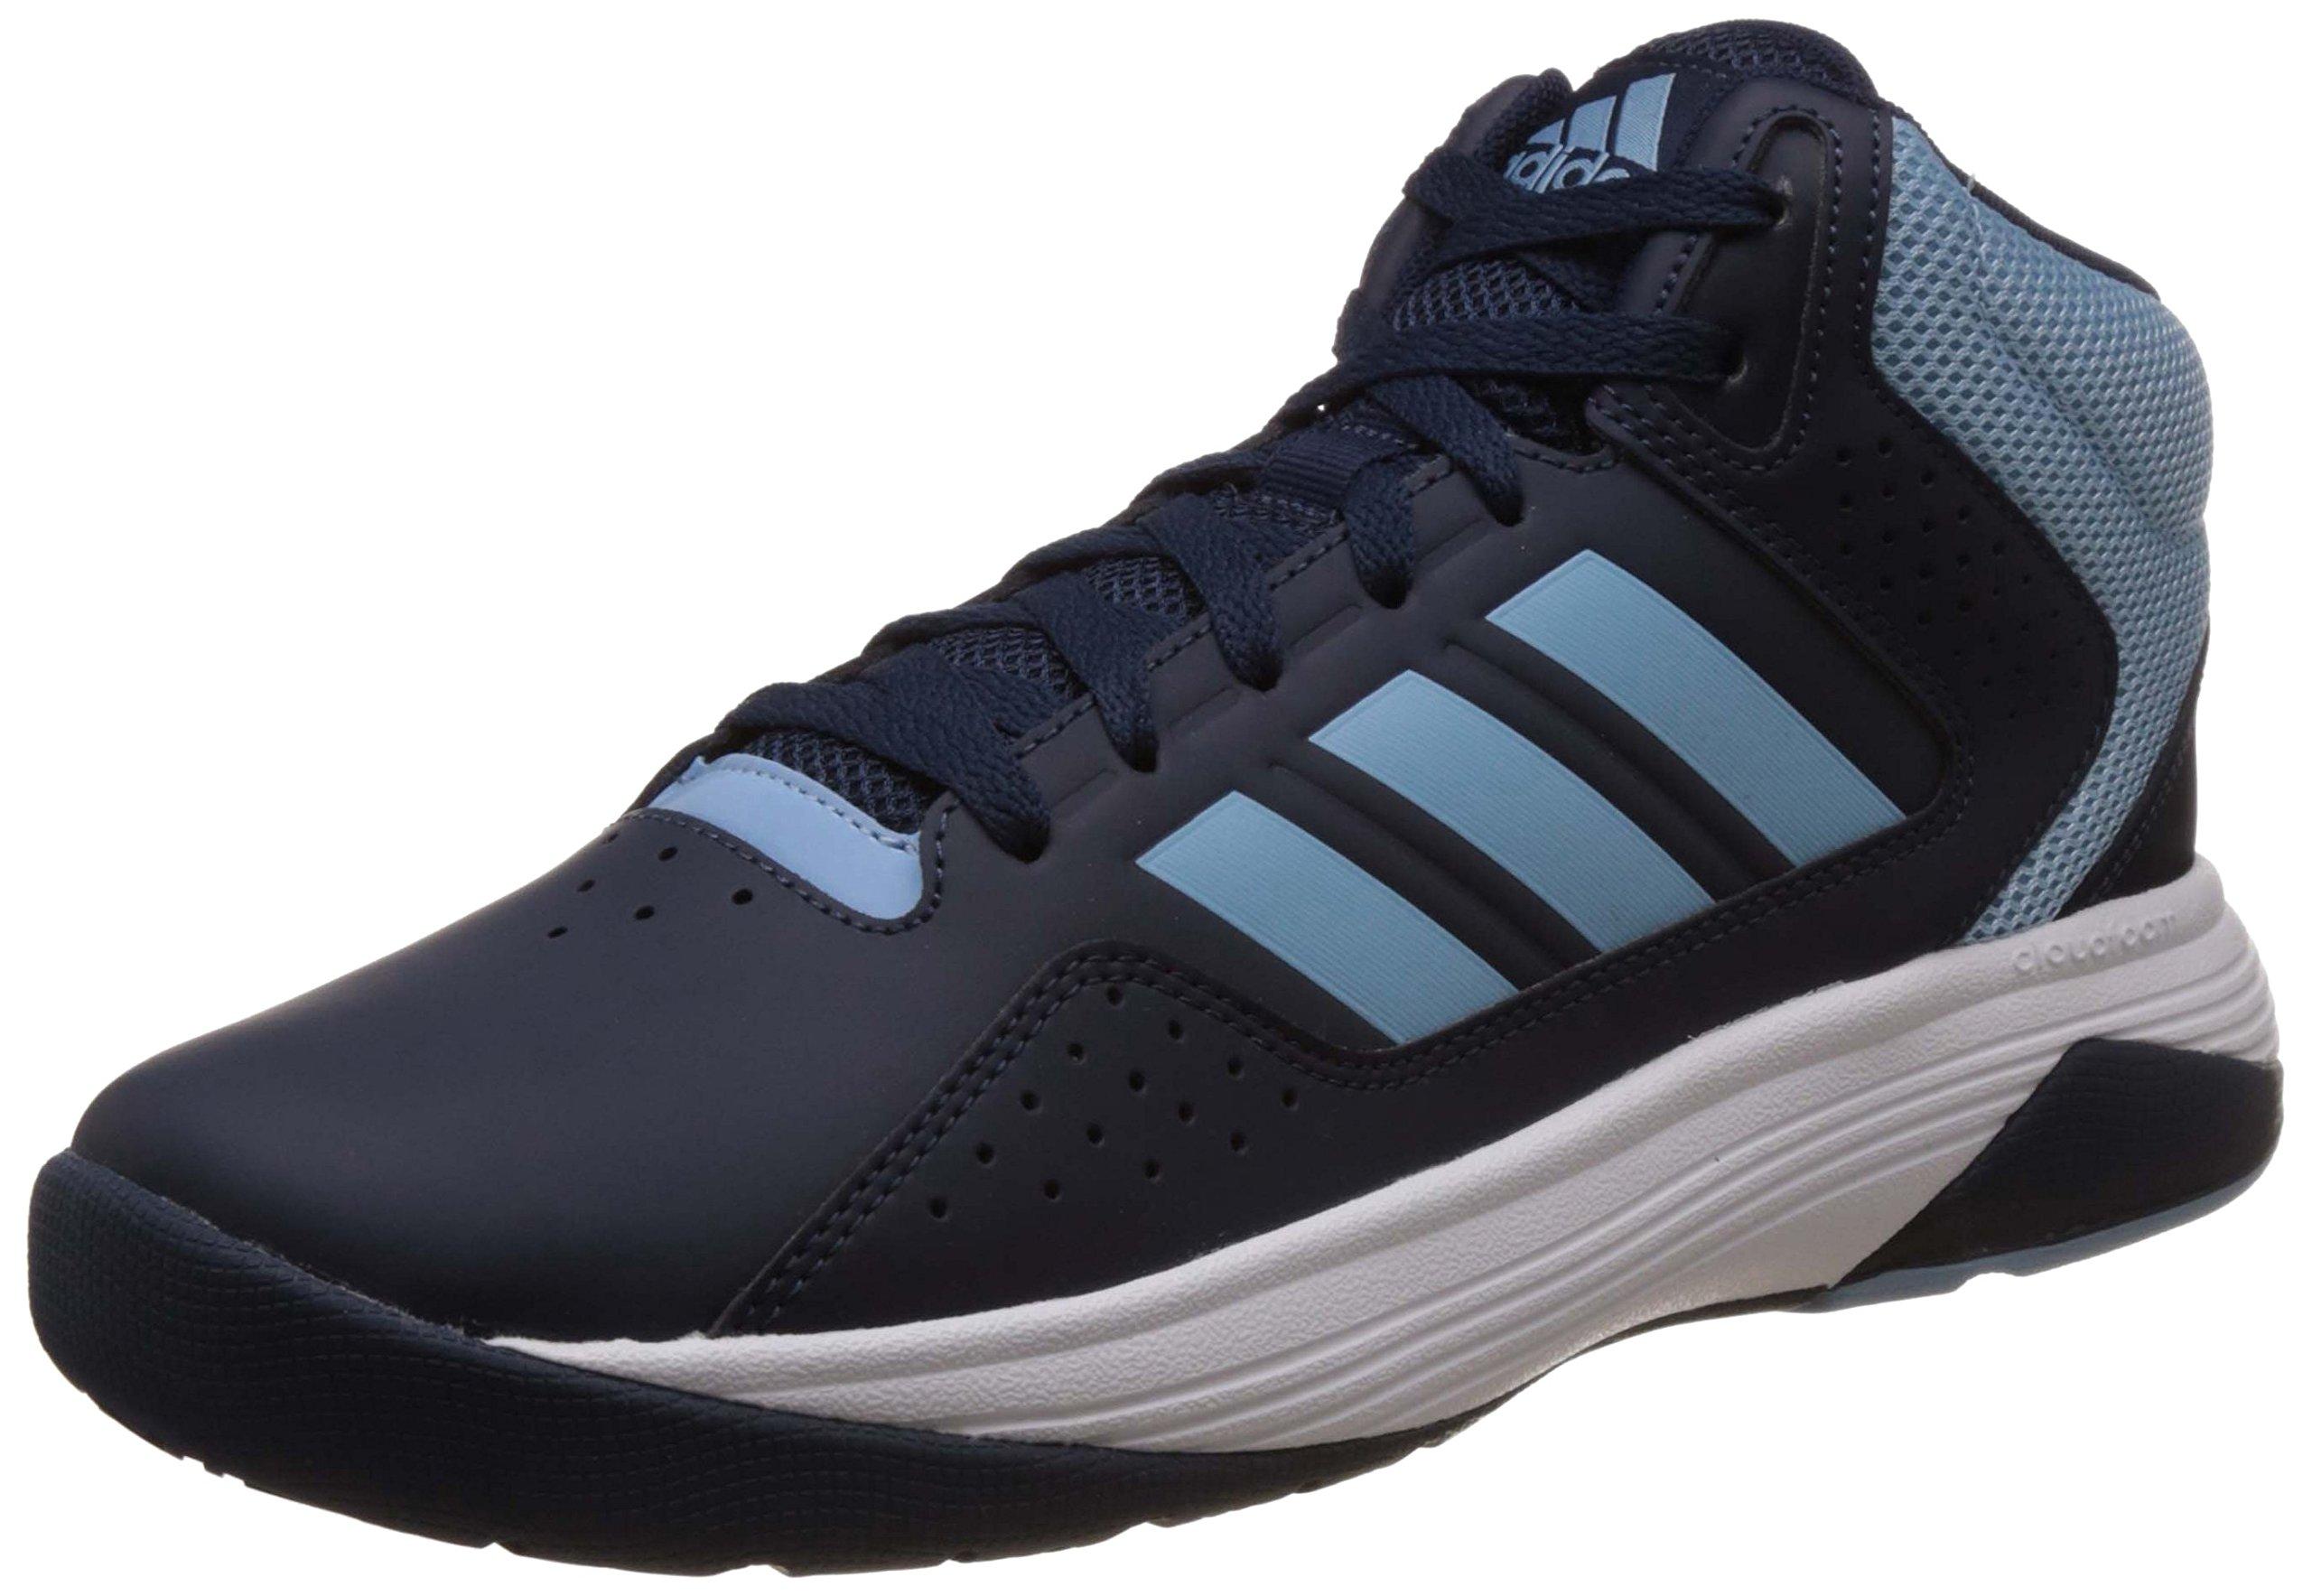 Adidas NEO Men's Cloudfoam Ilation Mid Basketball Shoes- Buy ...